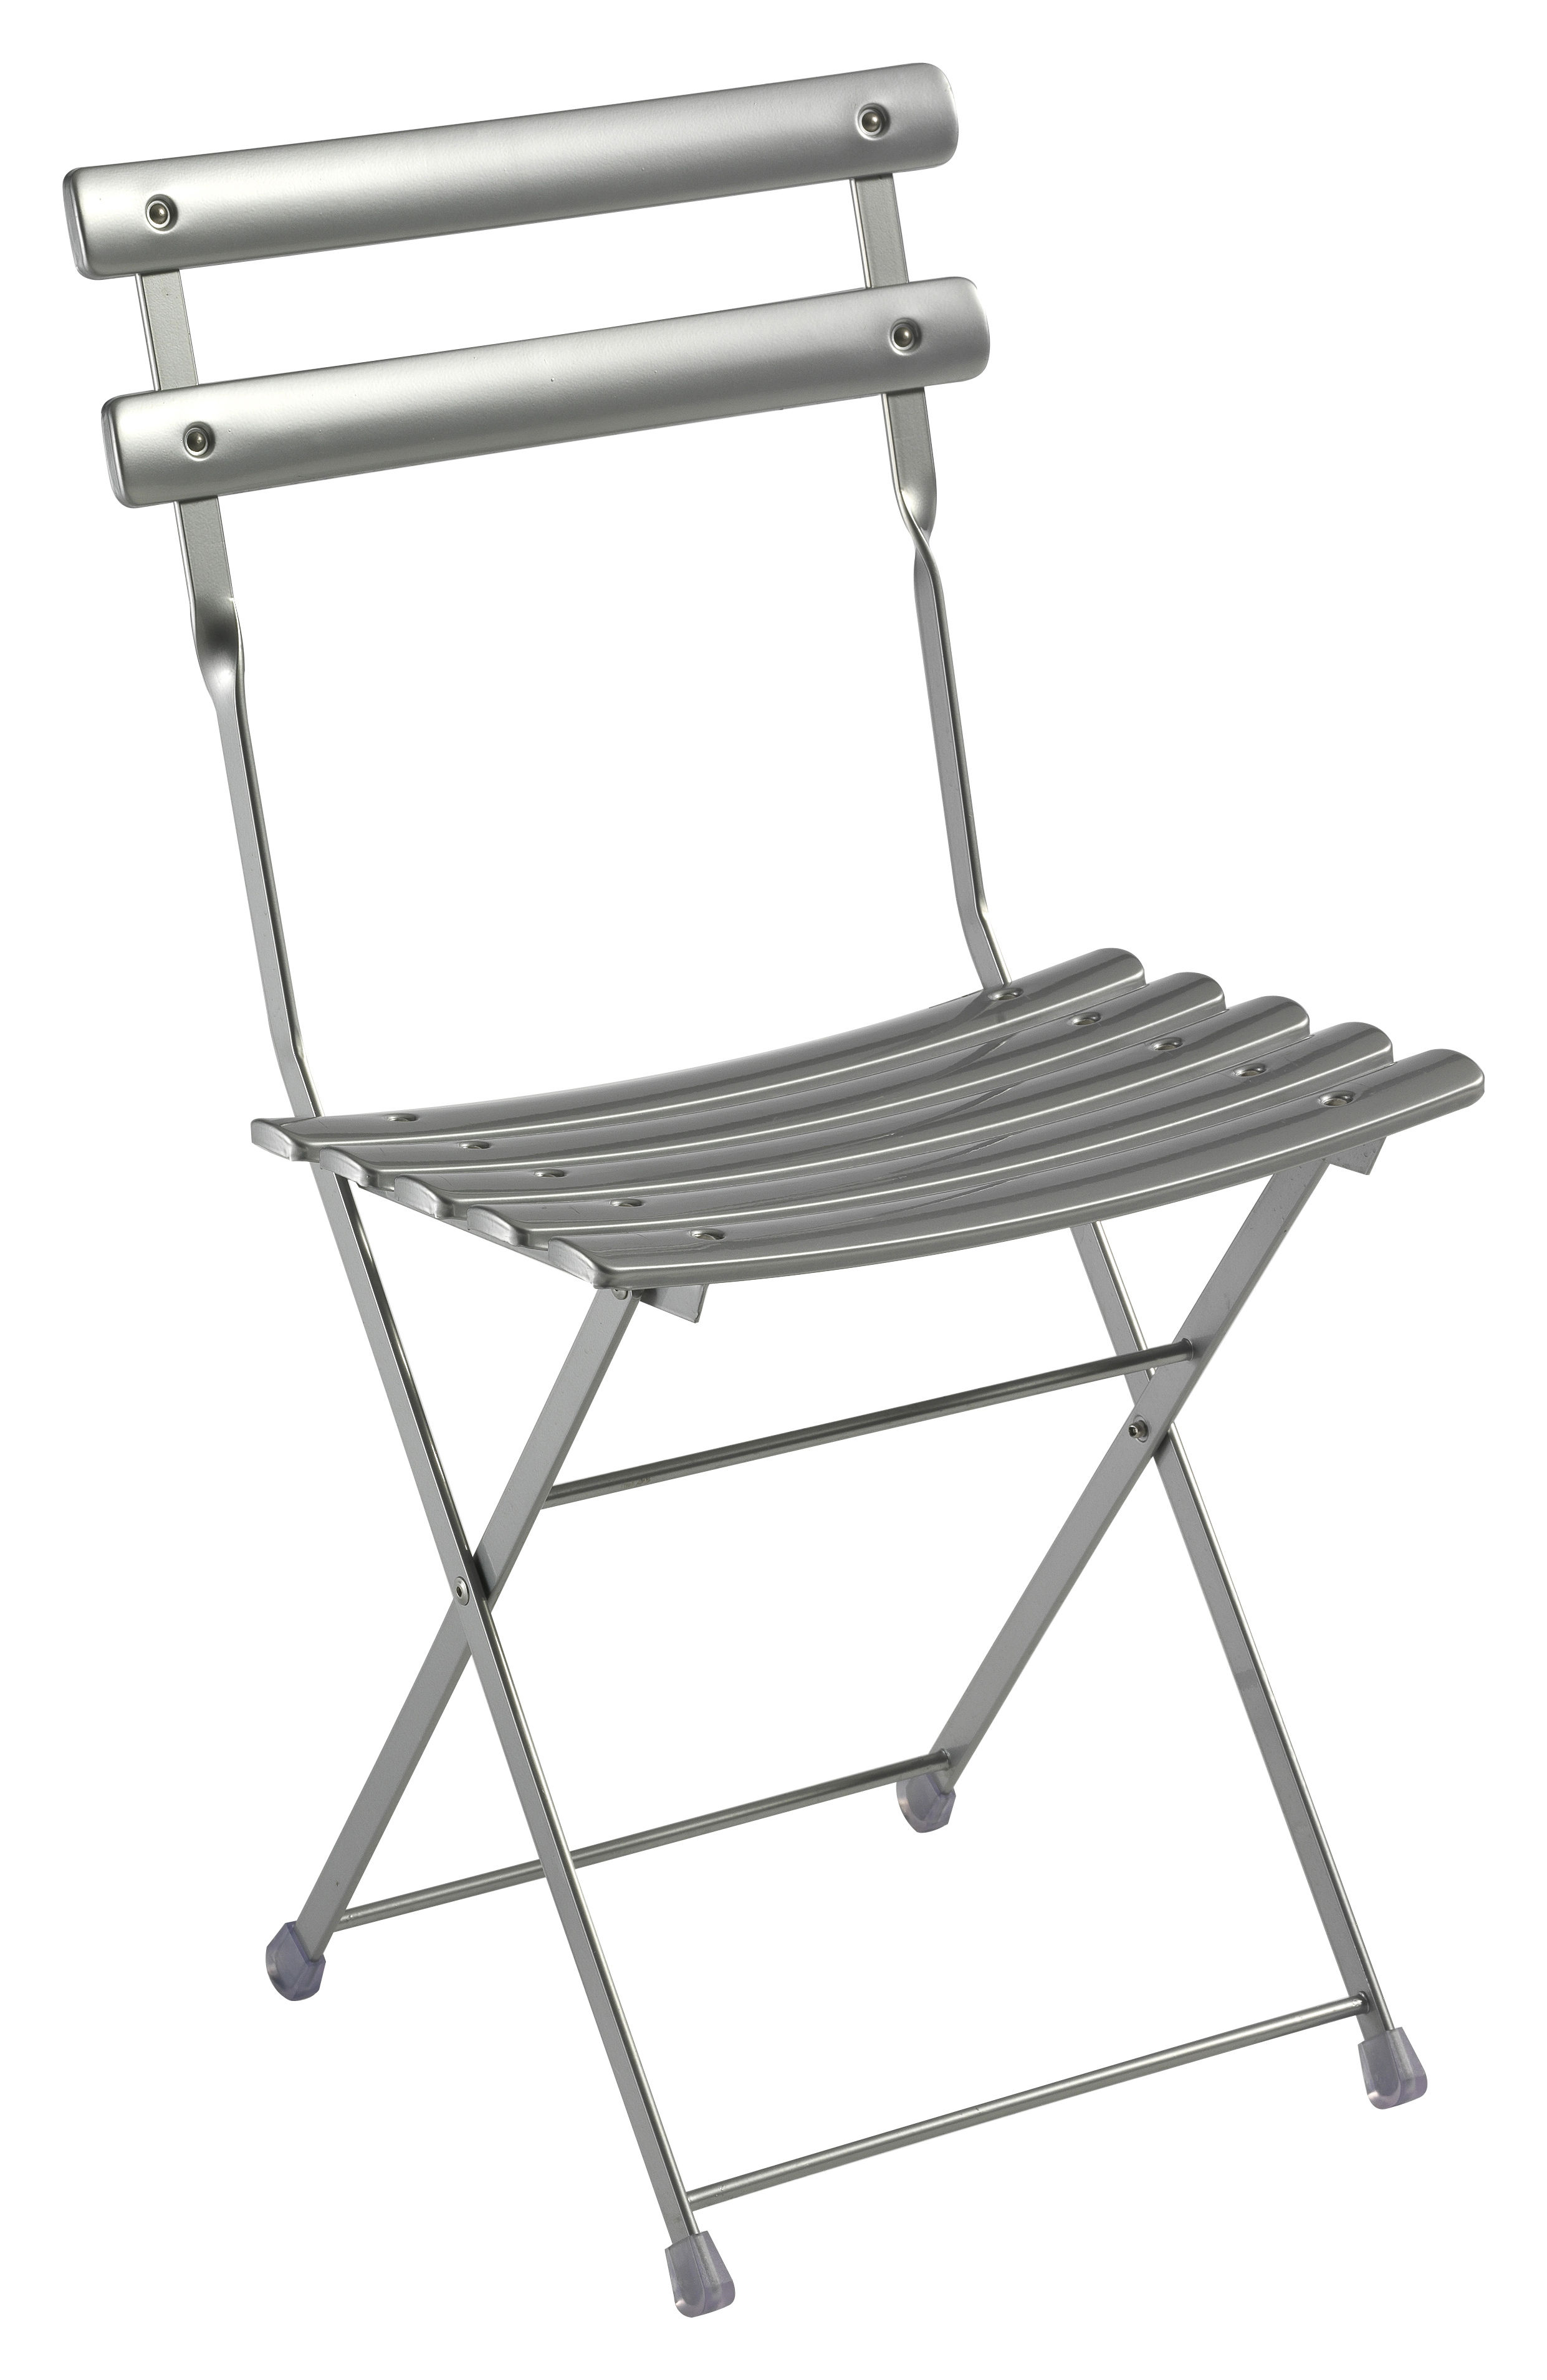 chaise pliante arc en ciel m tal aluminium emu. Black Bedroom Furniture Sets. Home Design Ideas